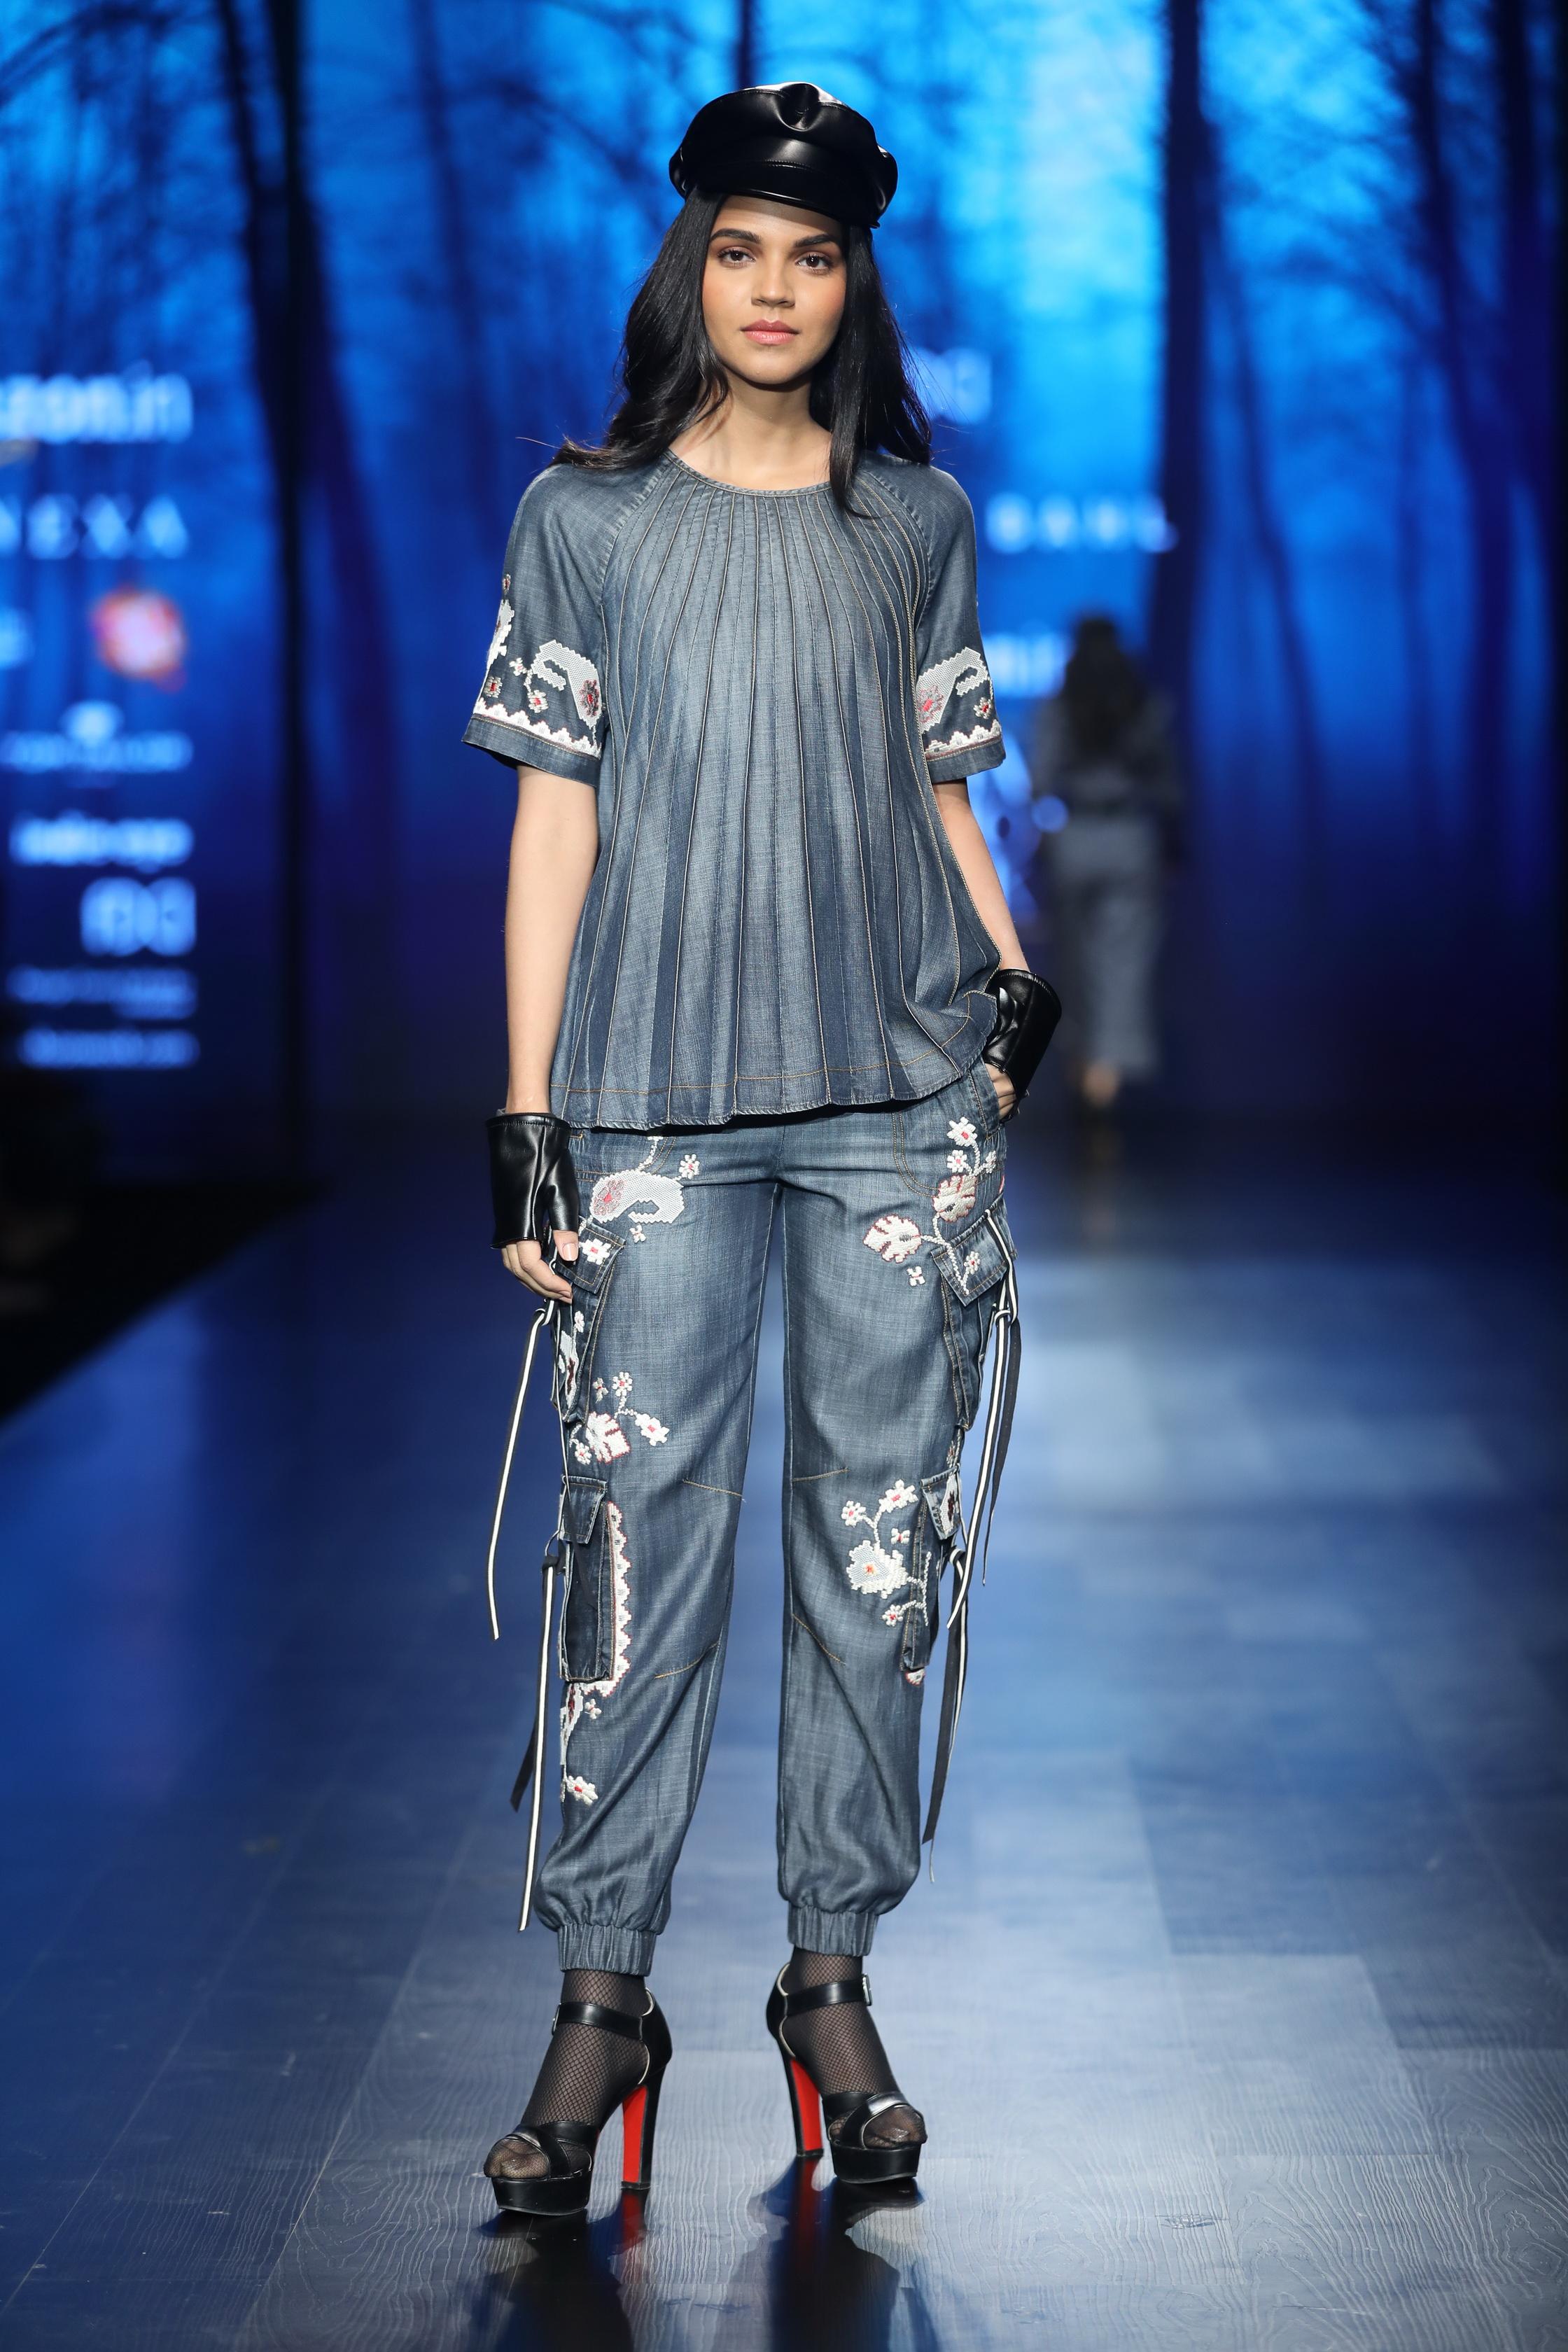 Vineet Bahl at FDCI Amazon India Fashion Week Autumn Winter 2018